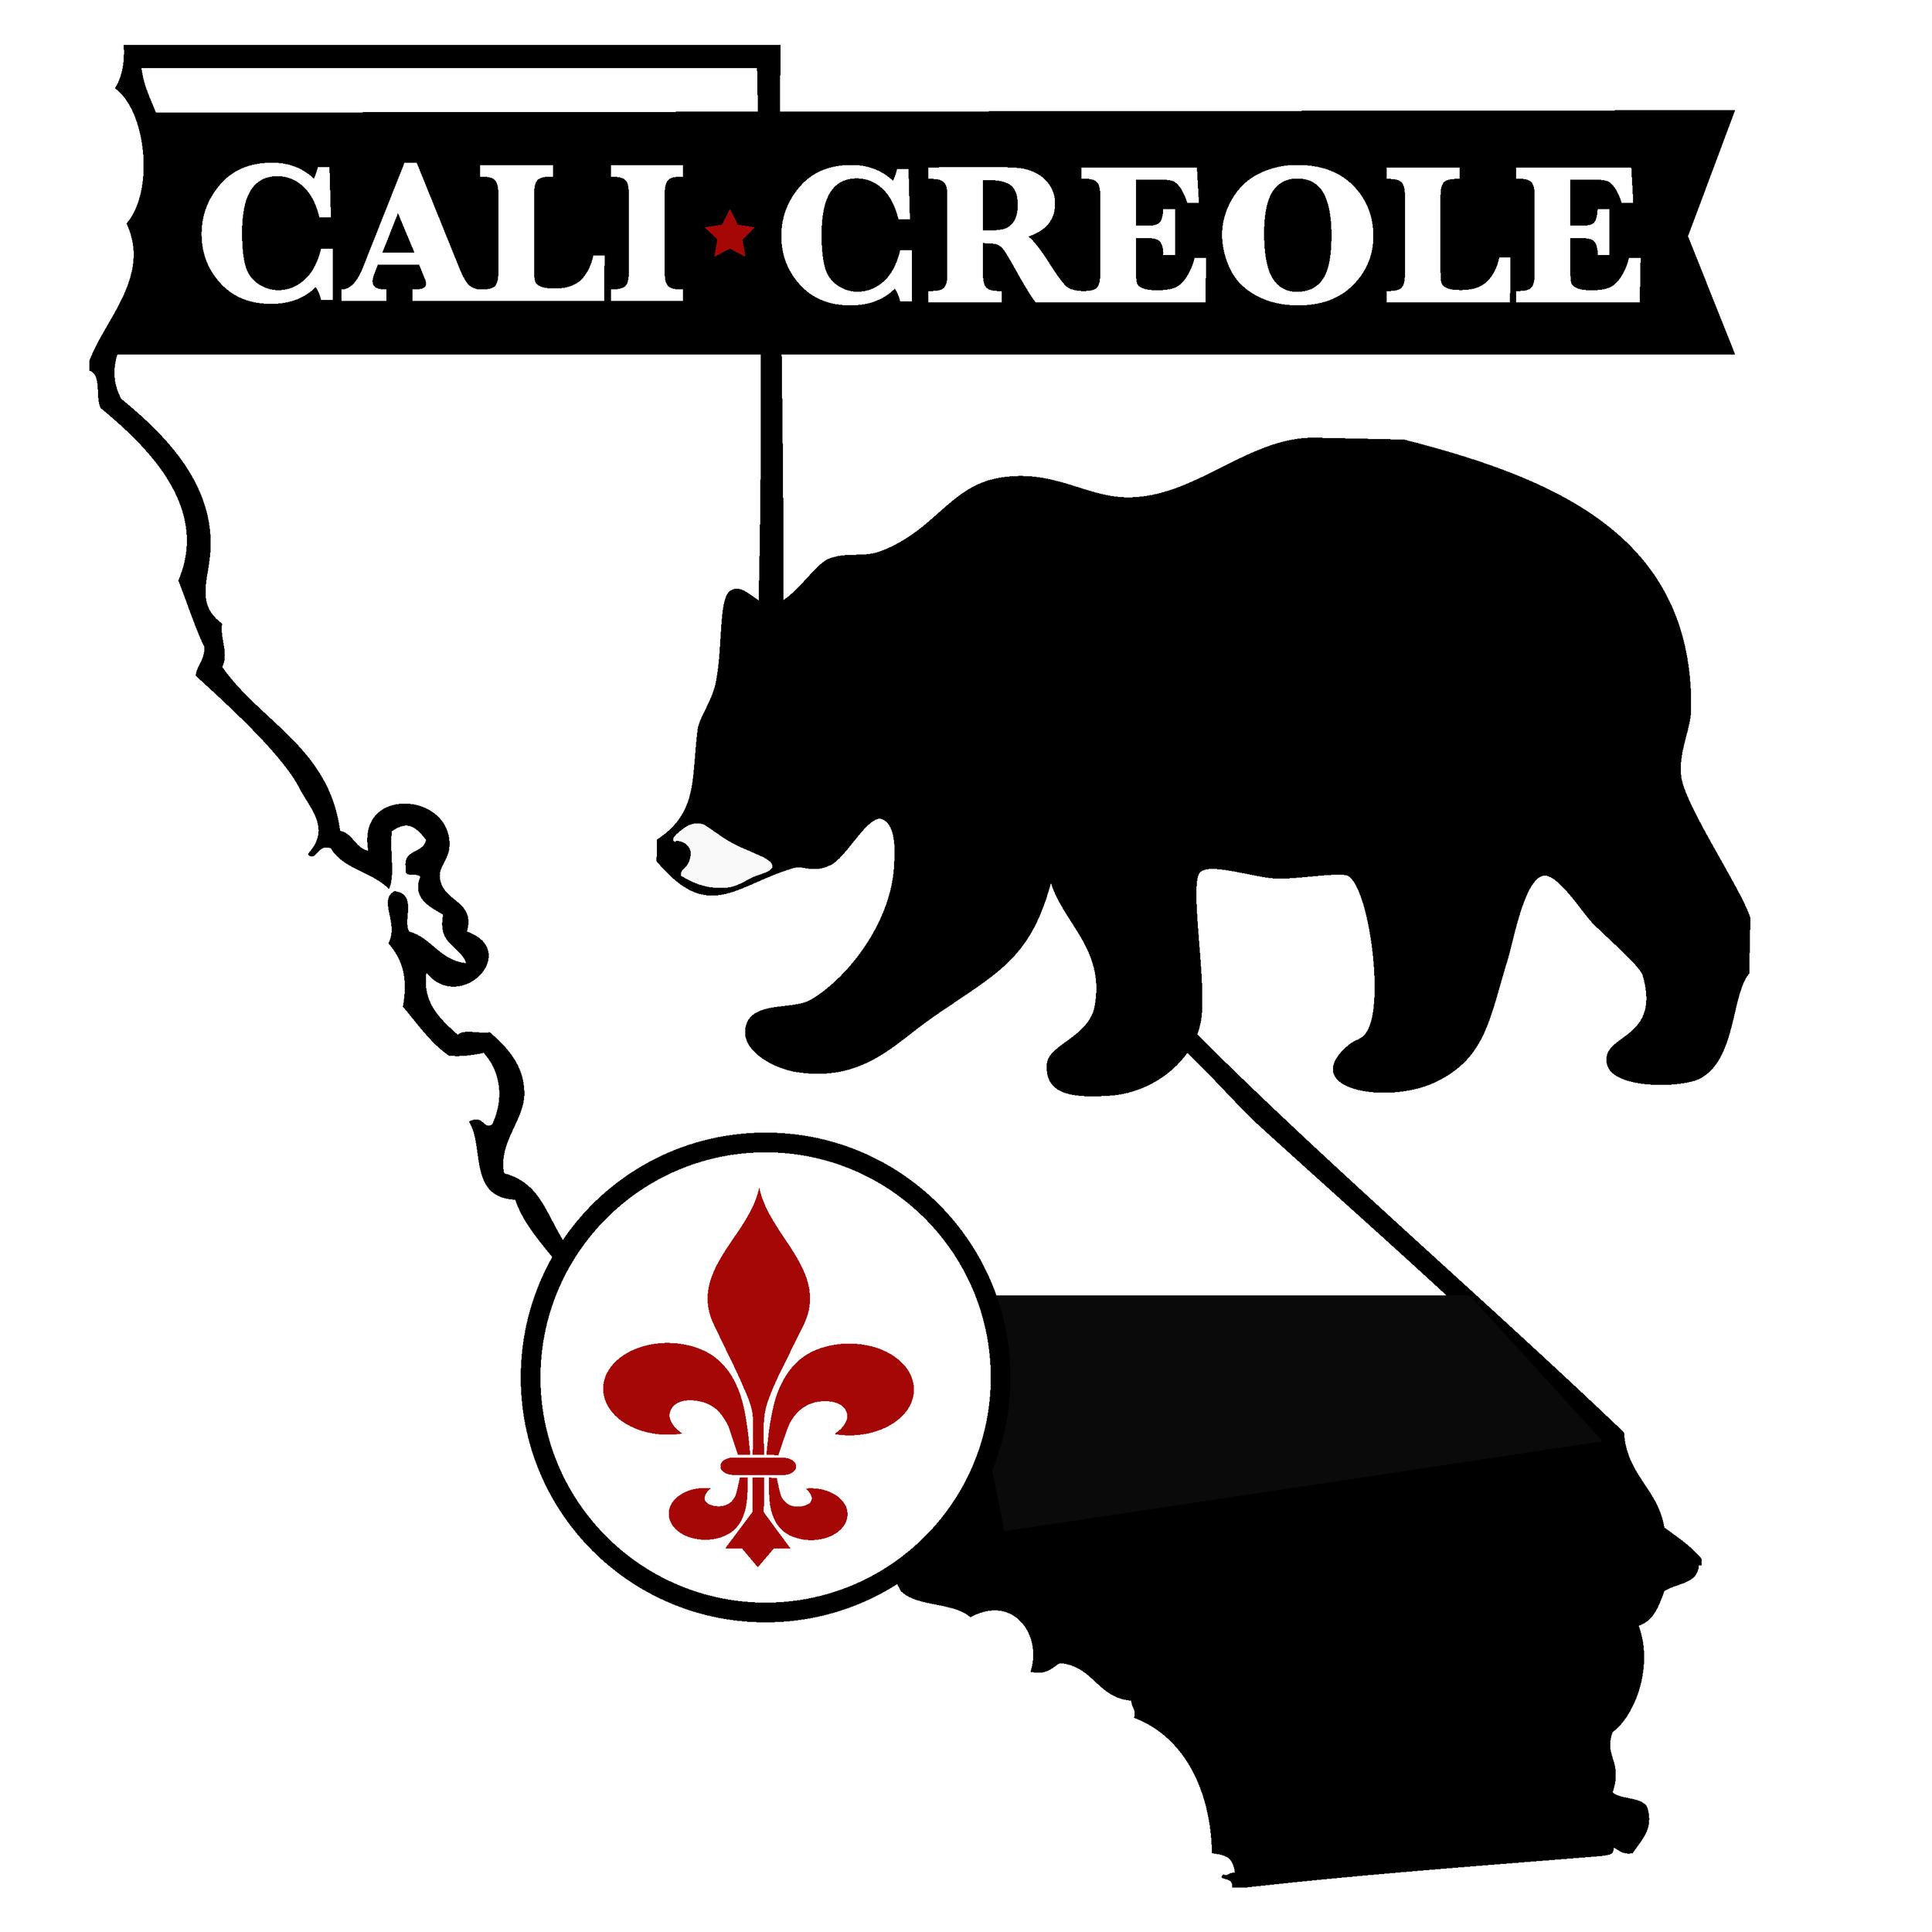 cali-creole logo